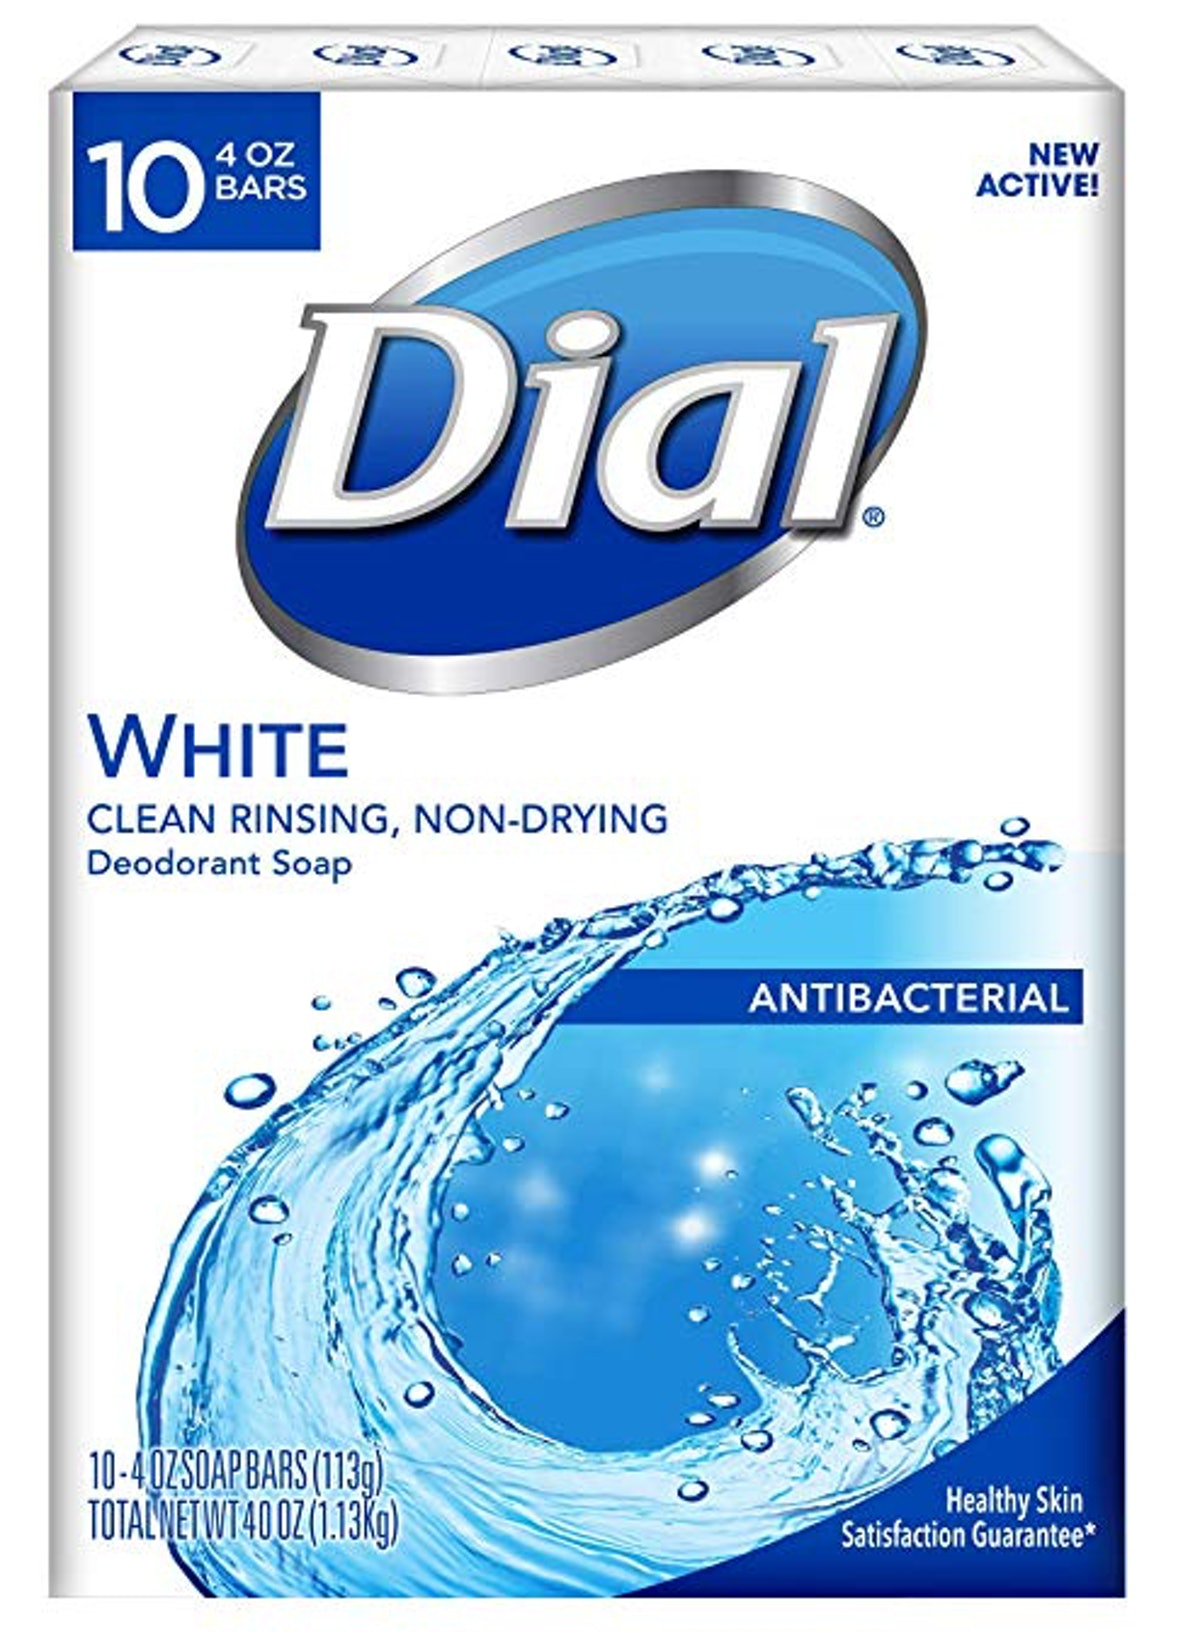 Antibacterial Deodorant Bar Soap